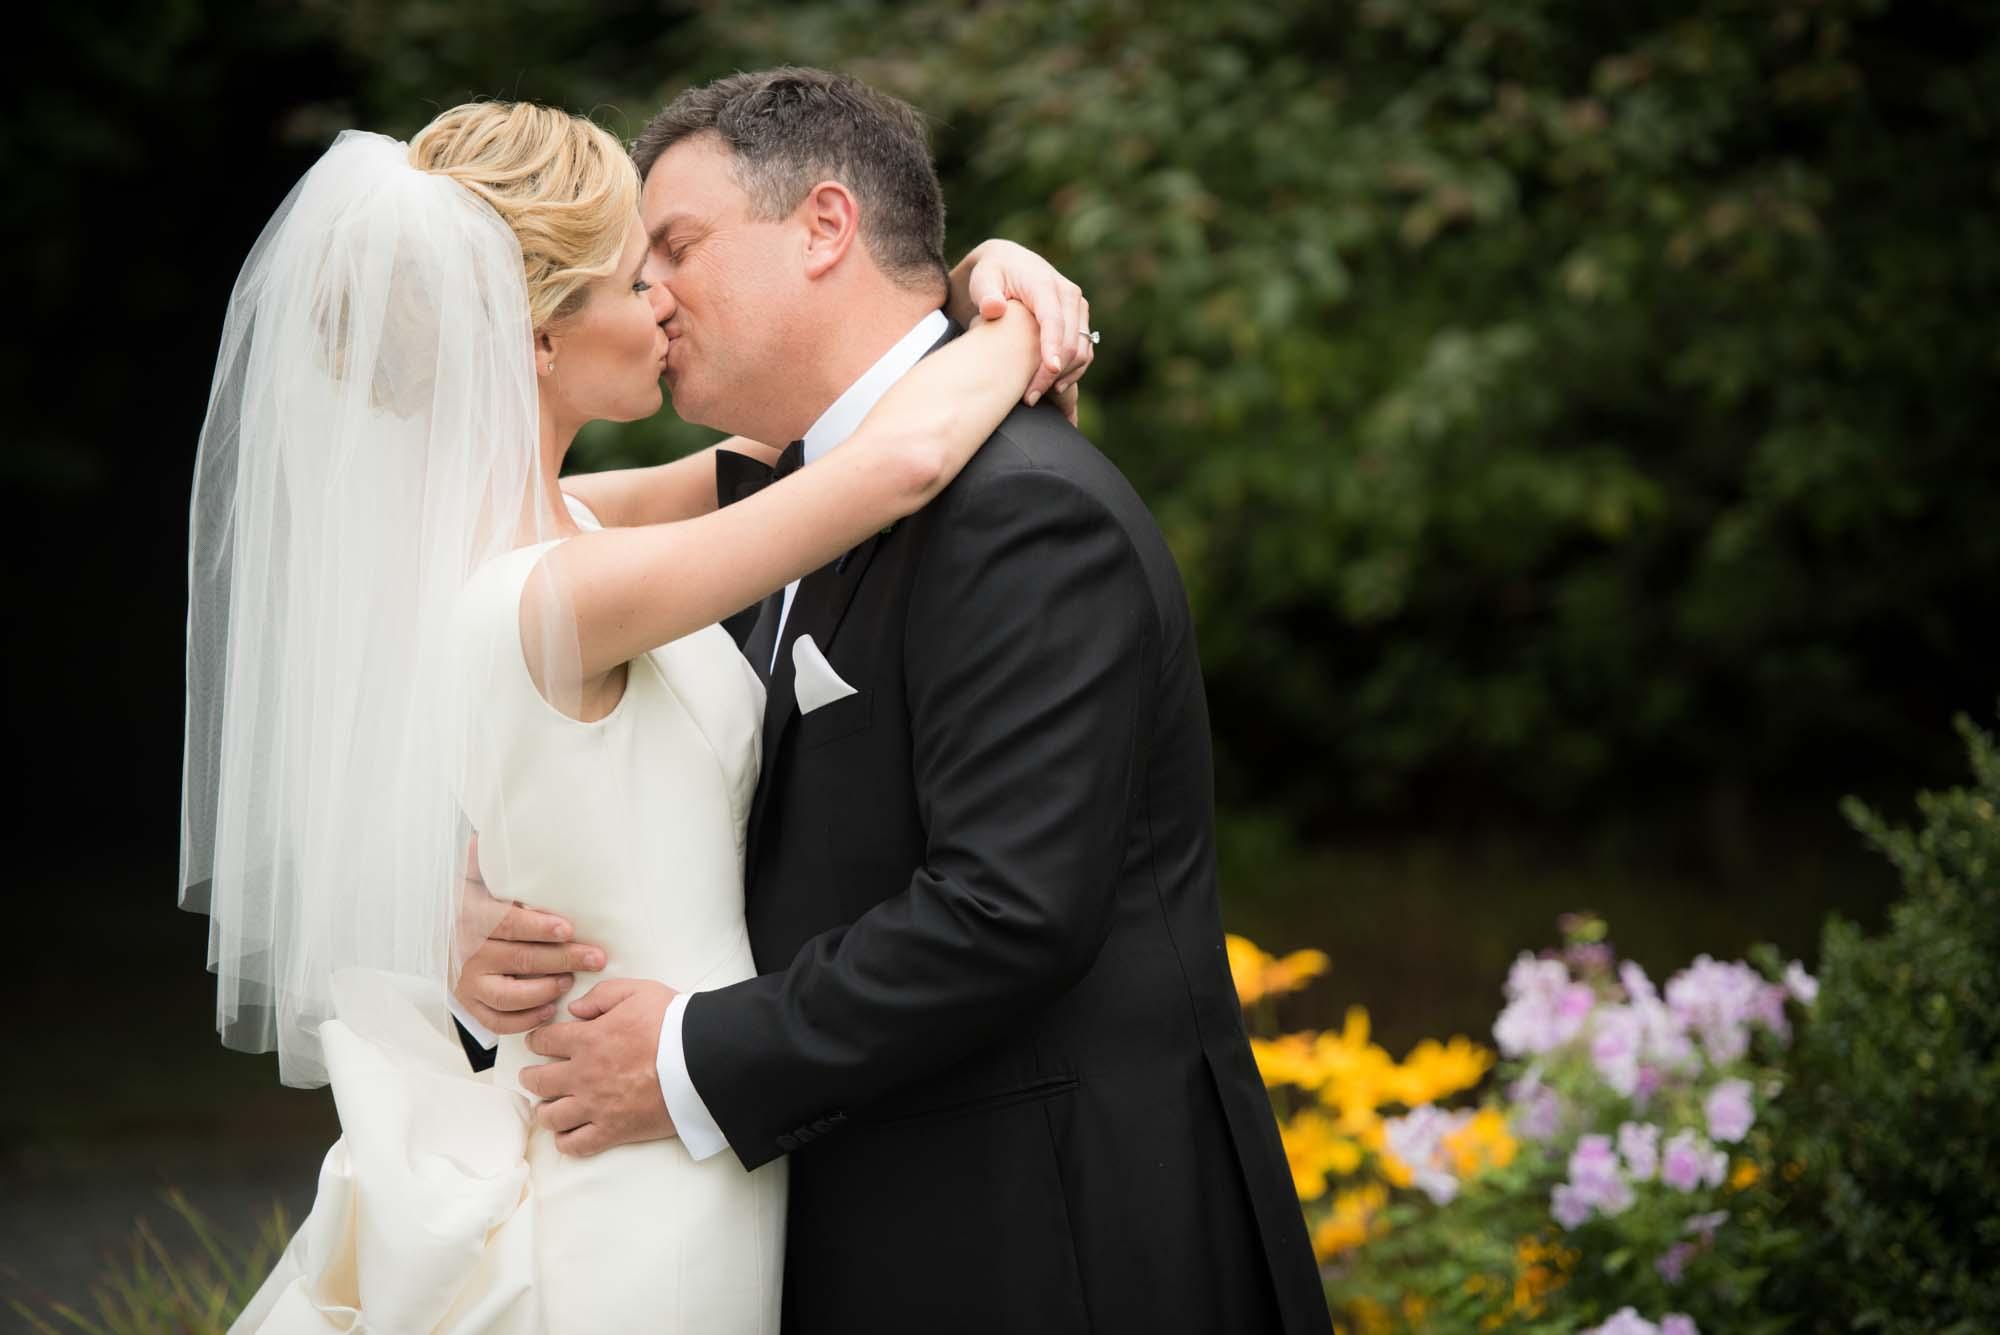 Newport-Rhode-Island-Wedding-Jamie-Levine-Photography-19.jpg